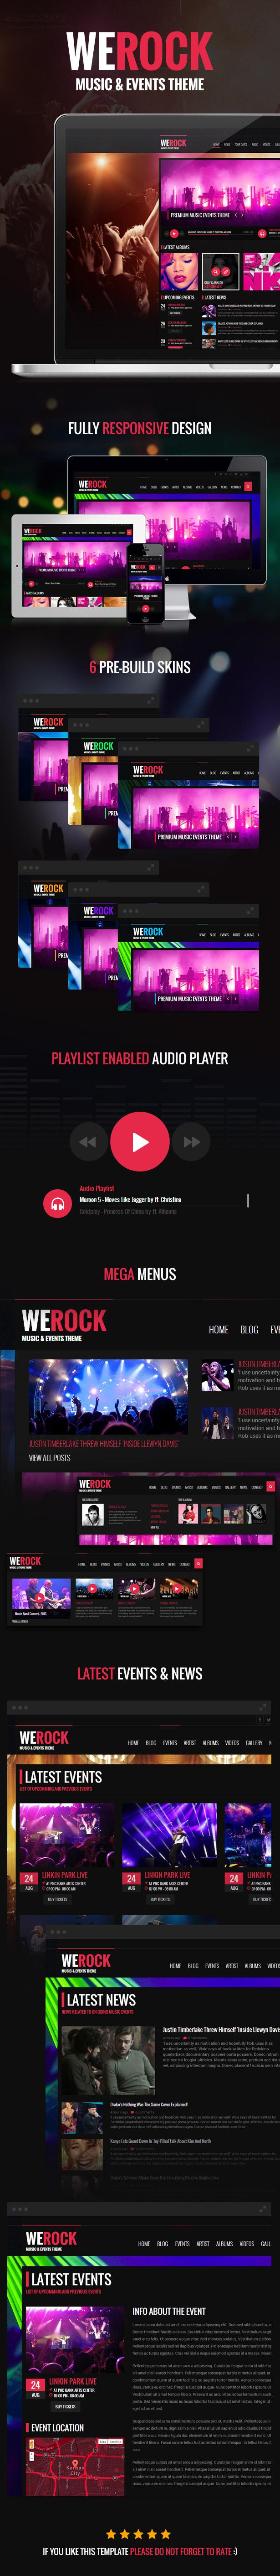 WeRock - Ajax Music Radio Streaming & Event HTML Template - 1